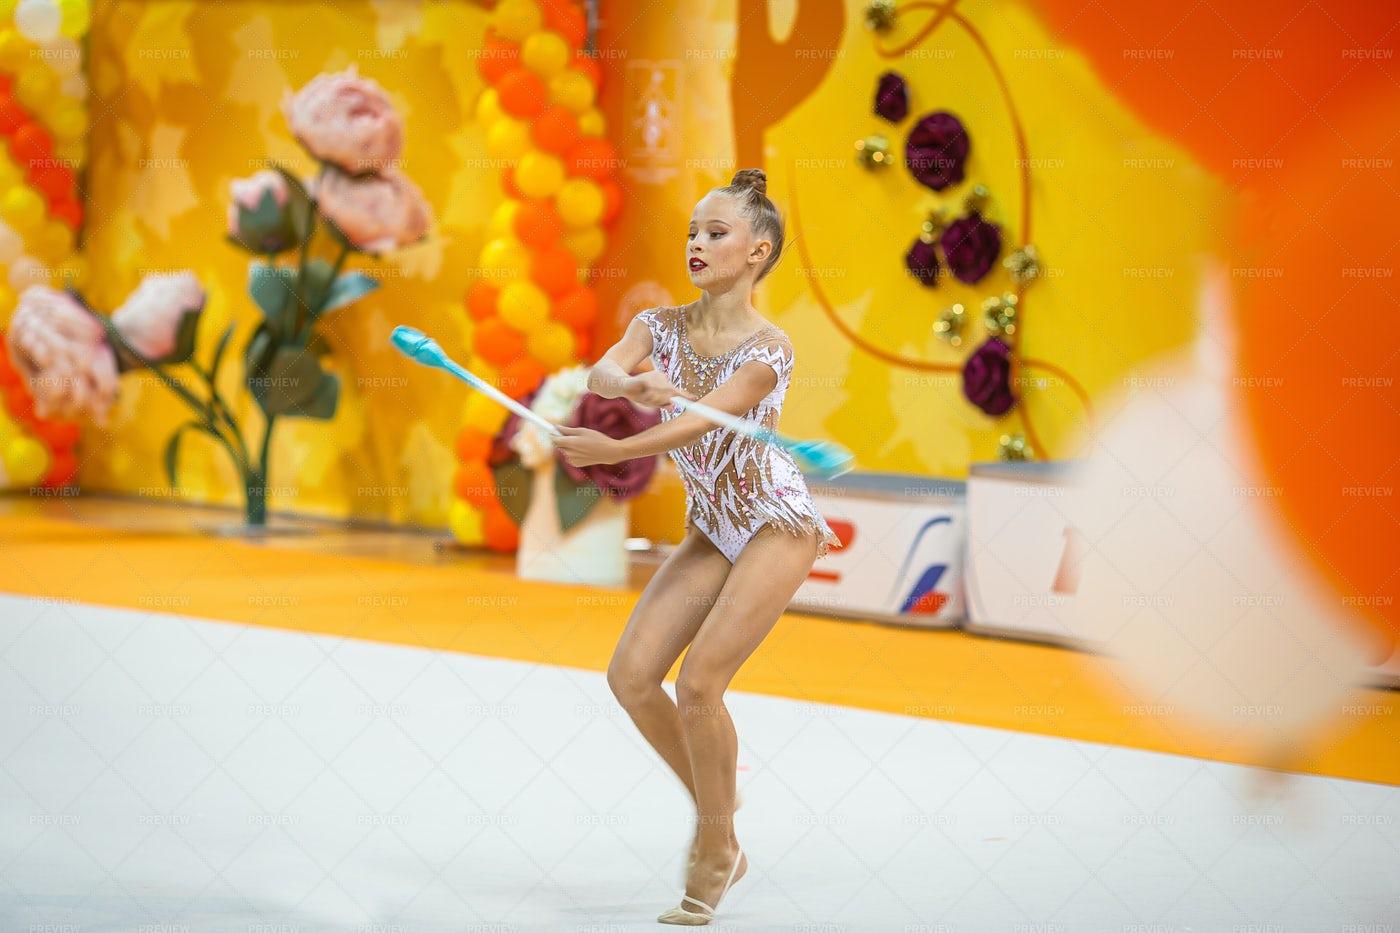 Girl In Gymnastic Act: Stock Photos